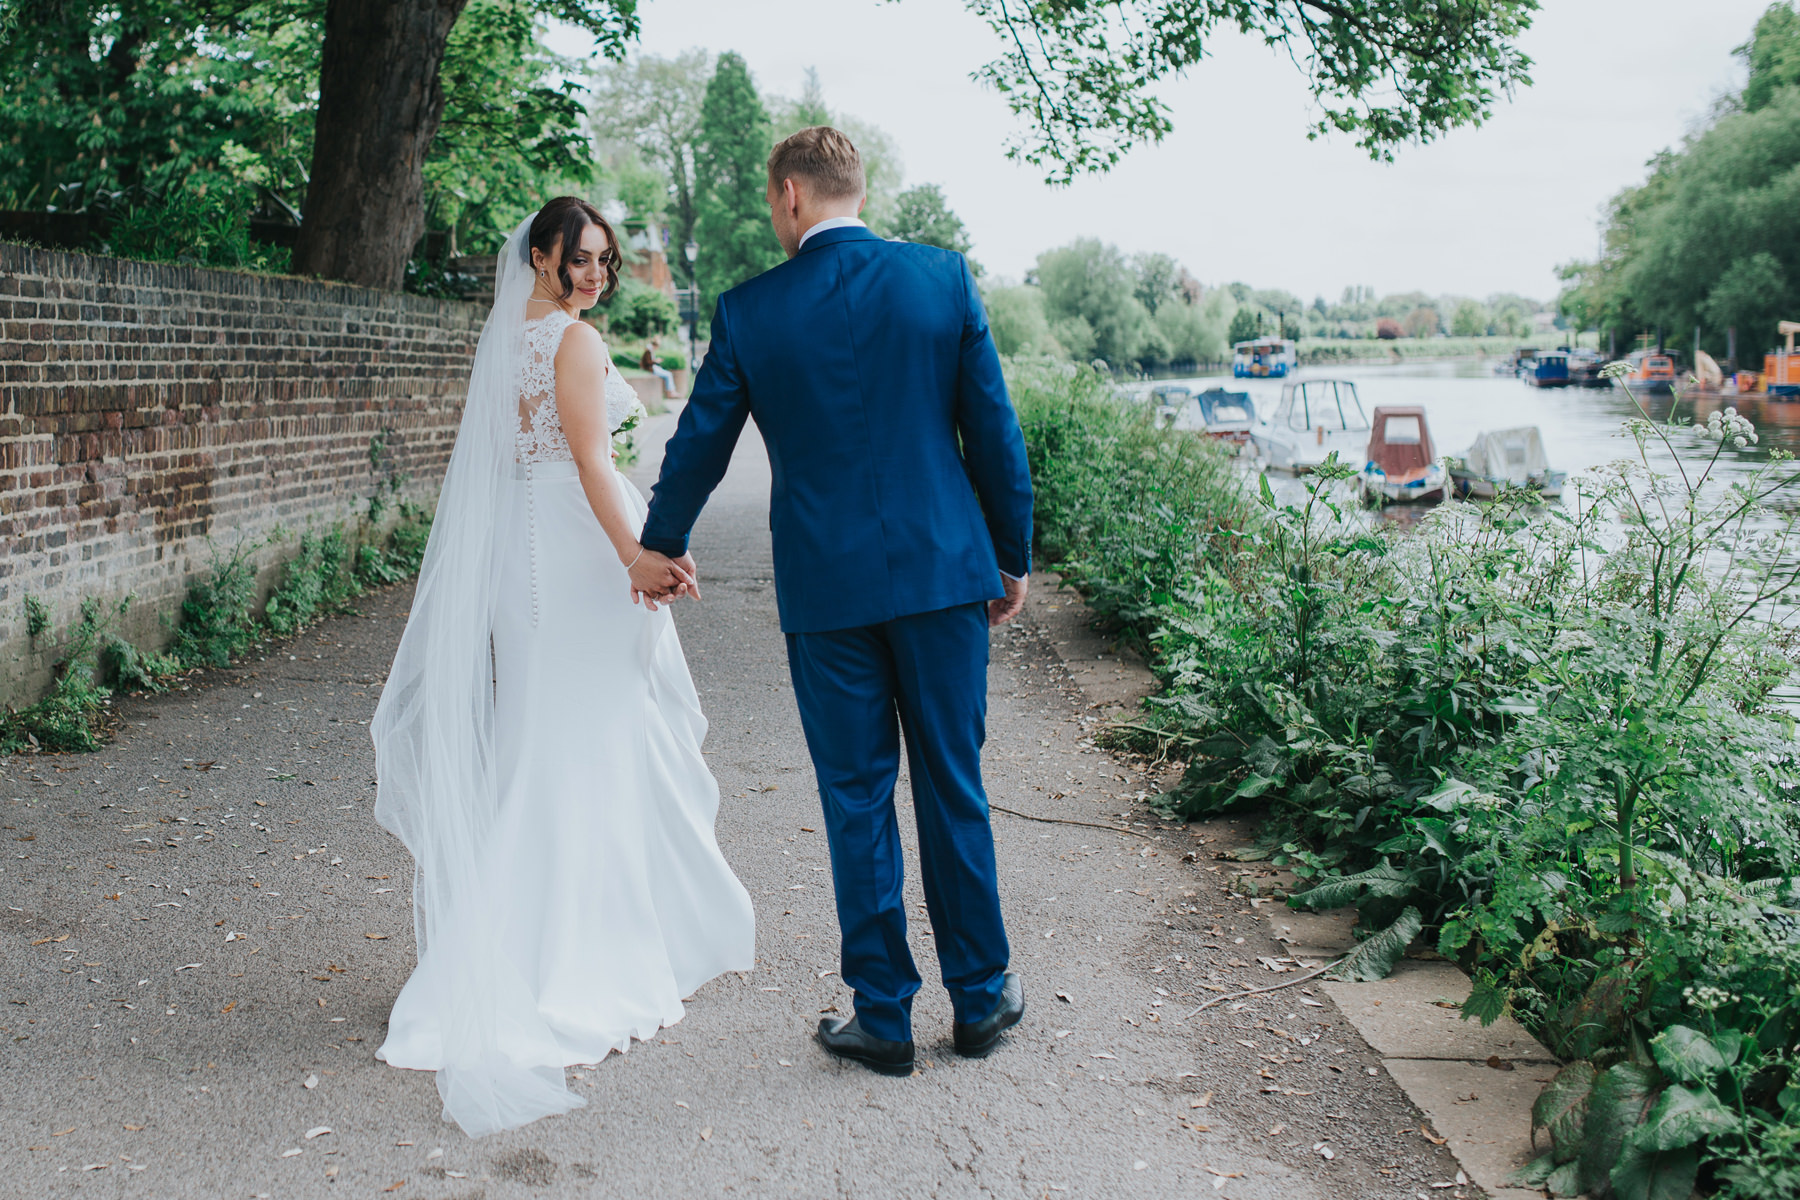 CRL-367-The Bingham wedding Richmond-Claire Rob bridal couple portraits on Thamespath.jpg